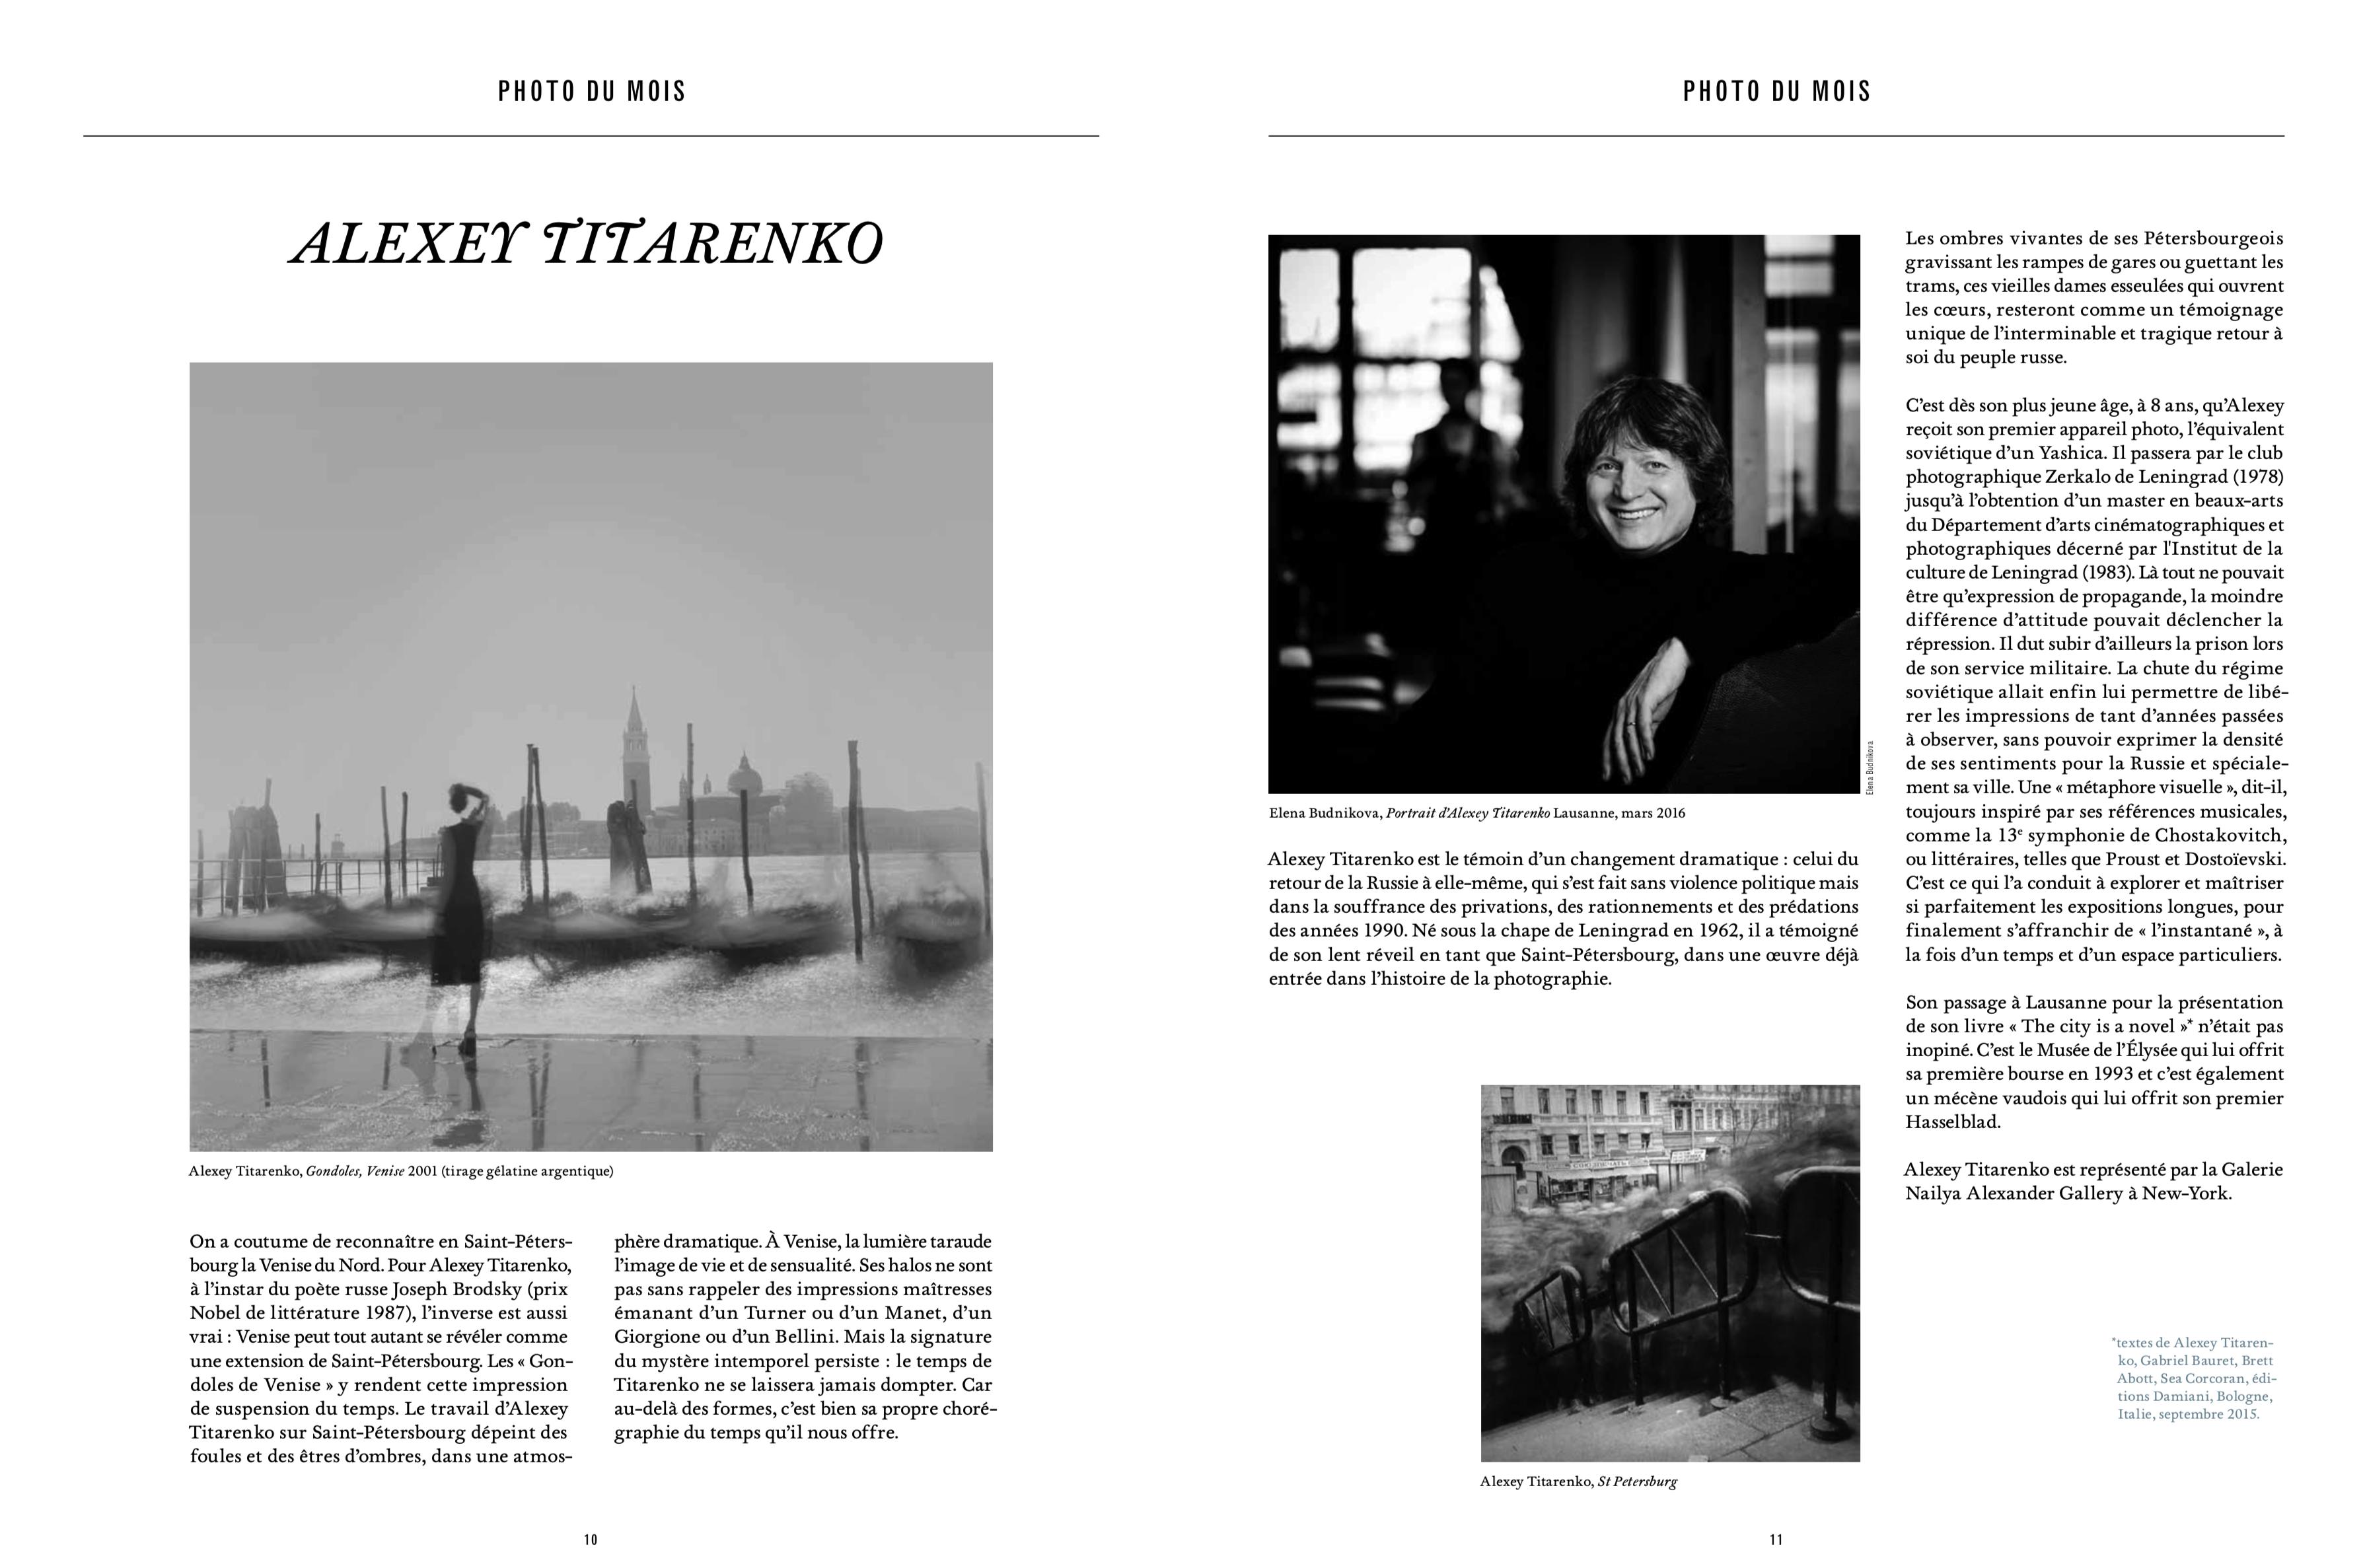 Magasin Market № 129, Geneva. Interview and portrait of Alexey Titarenko